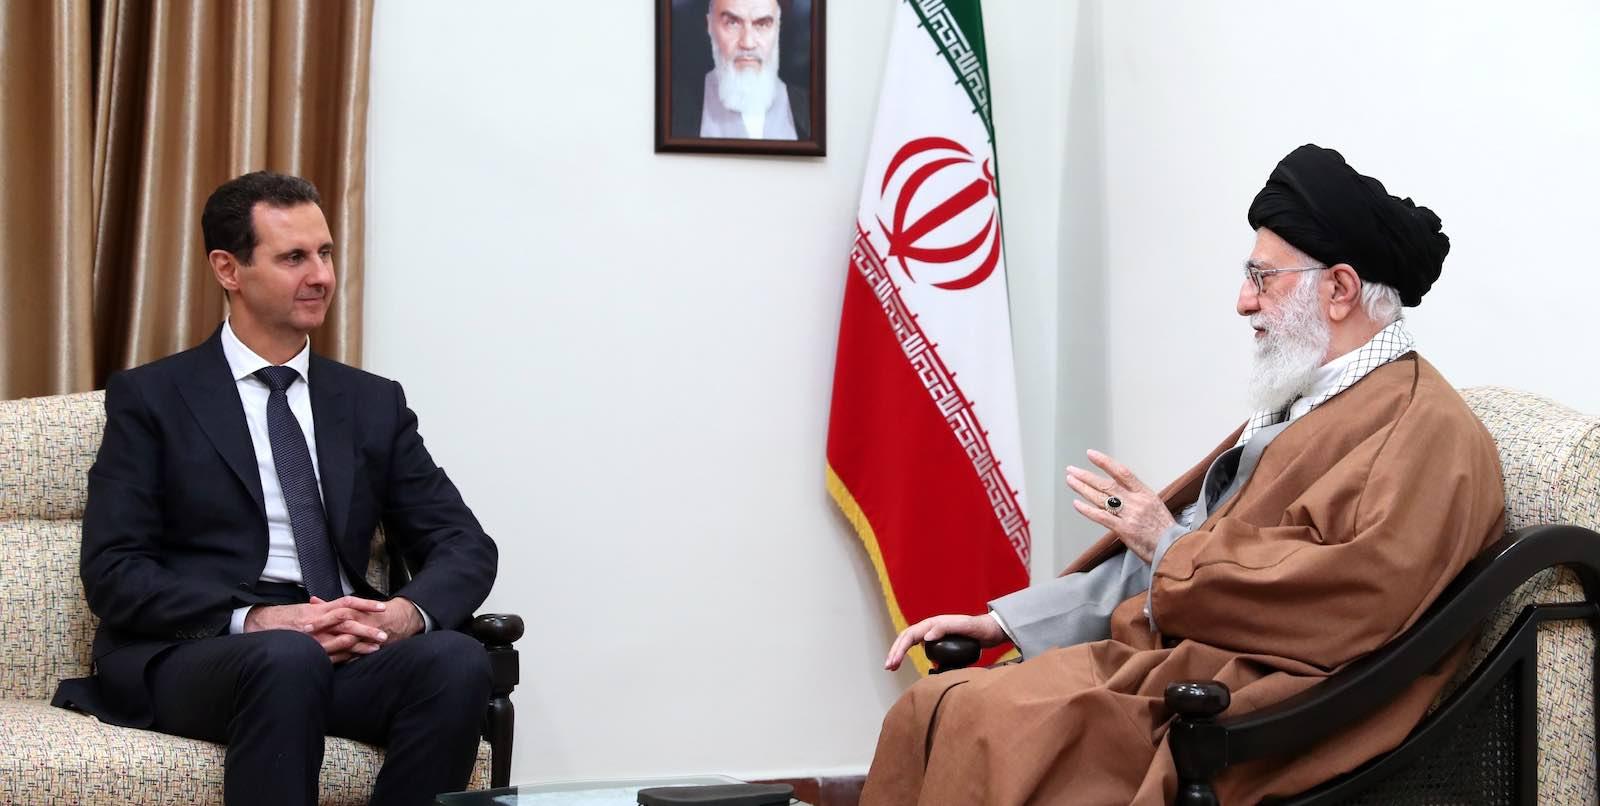 Iran's Ayatollah Ali Khamenei meets Syrian leader Bashar al-Assad in Tehran on 25 February (Photo by Iranian Leader Press Office via Getty)